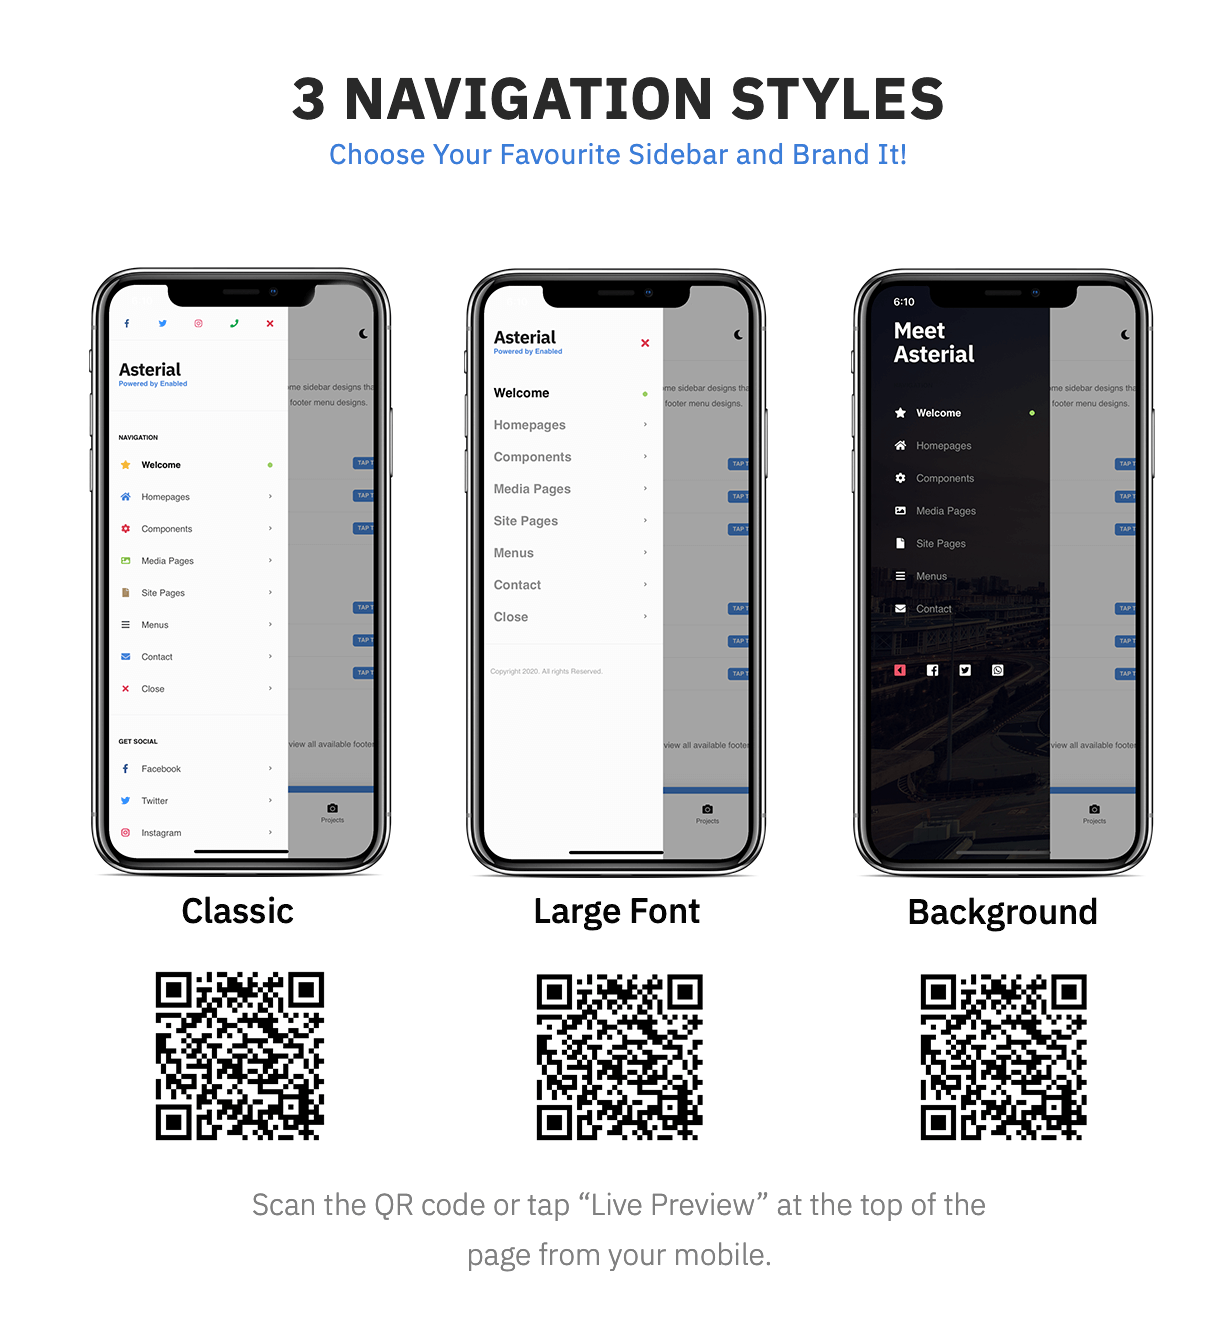 asterial2 - Asterial Mobile